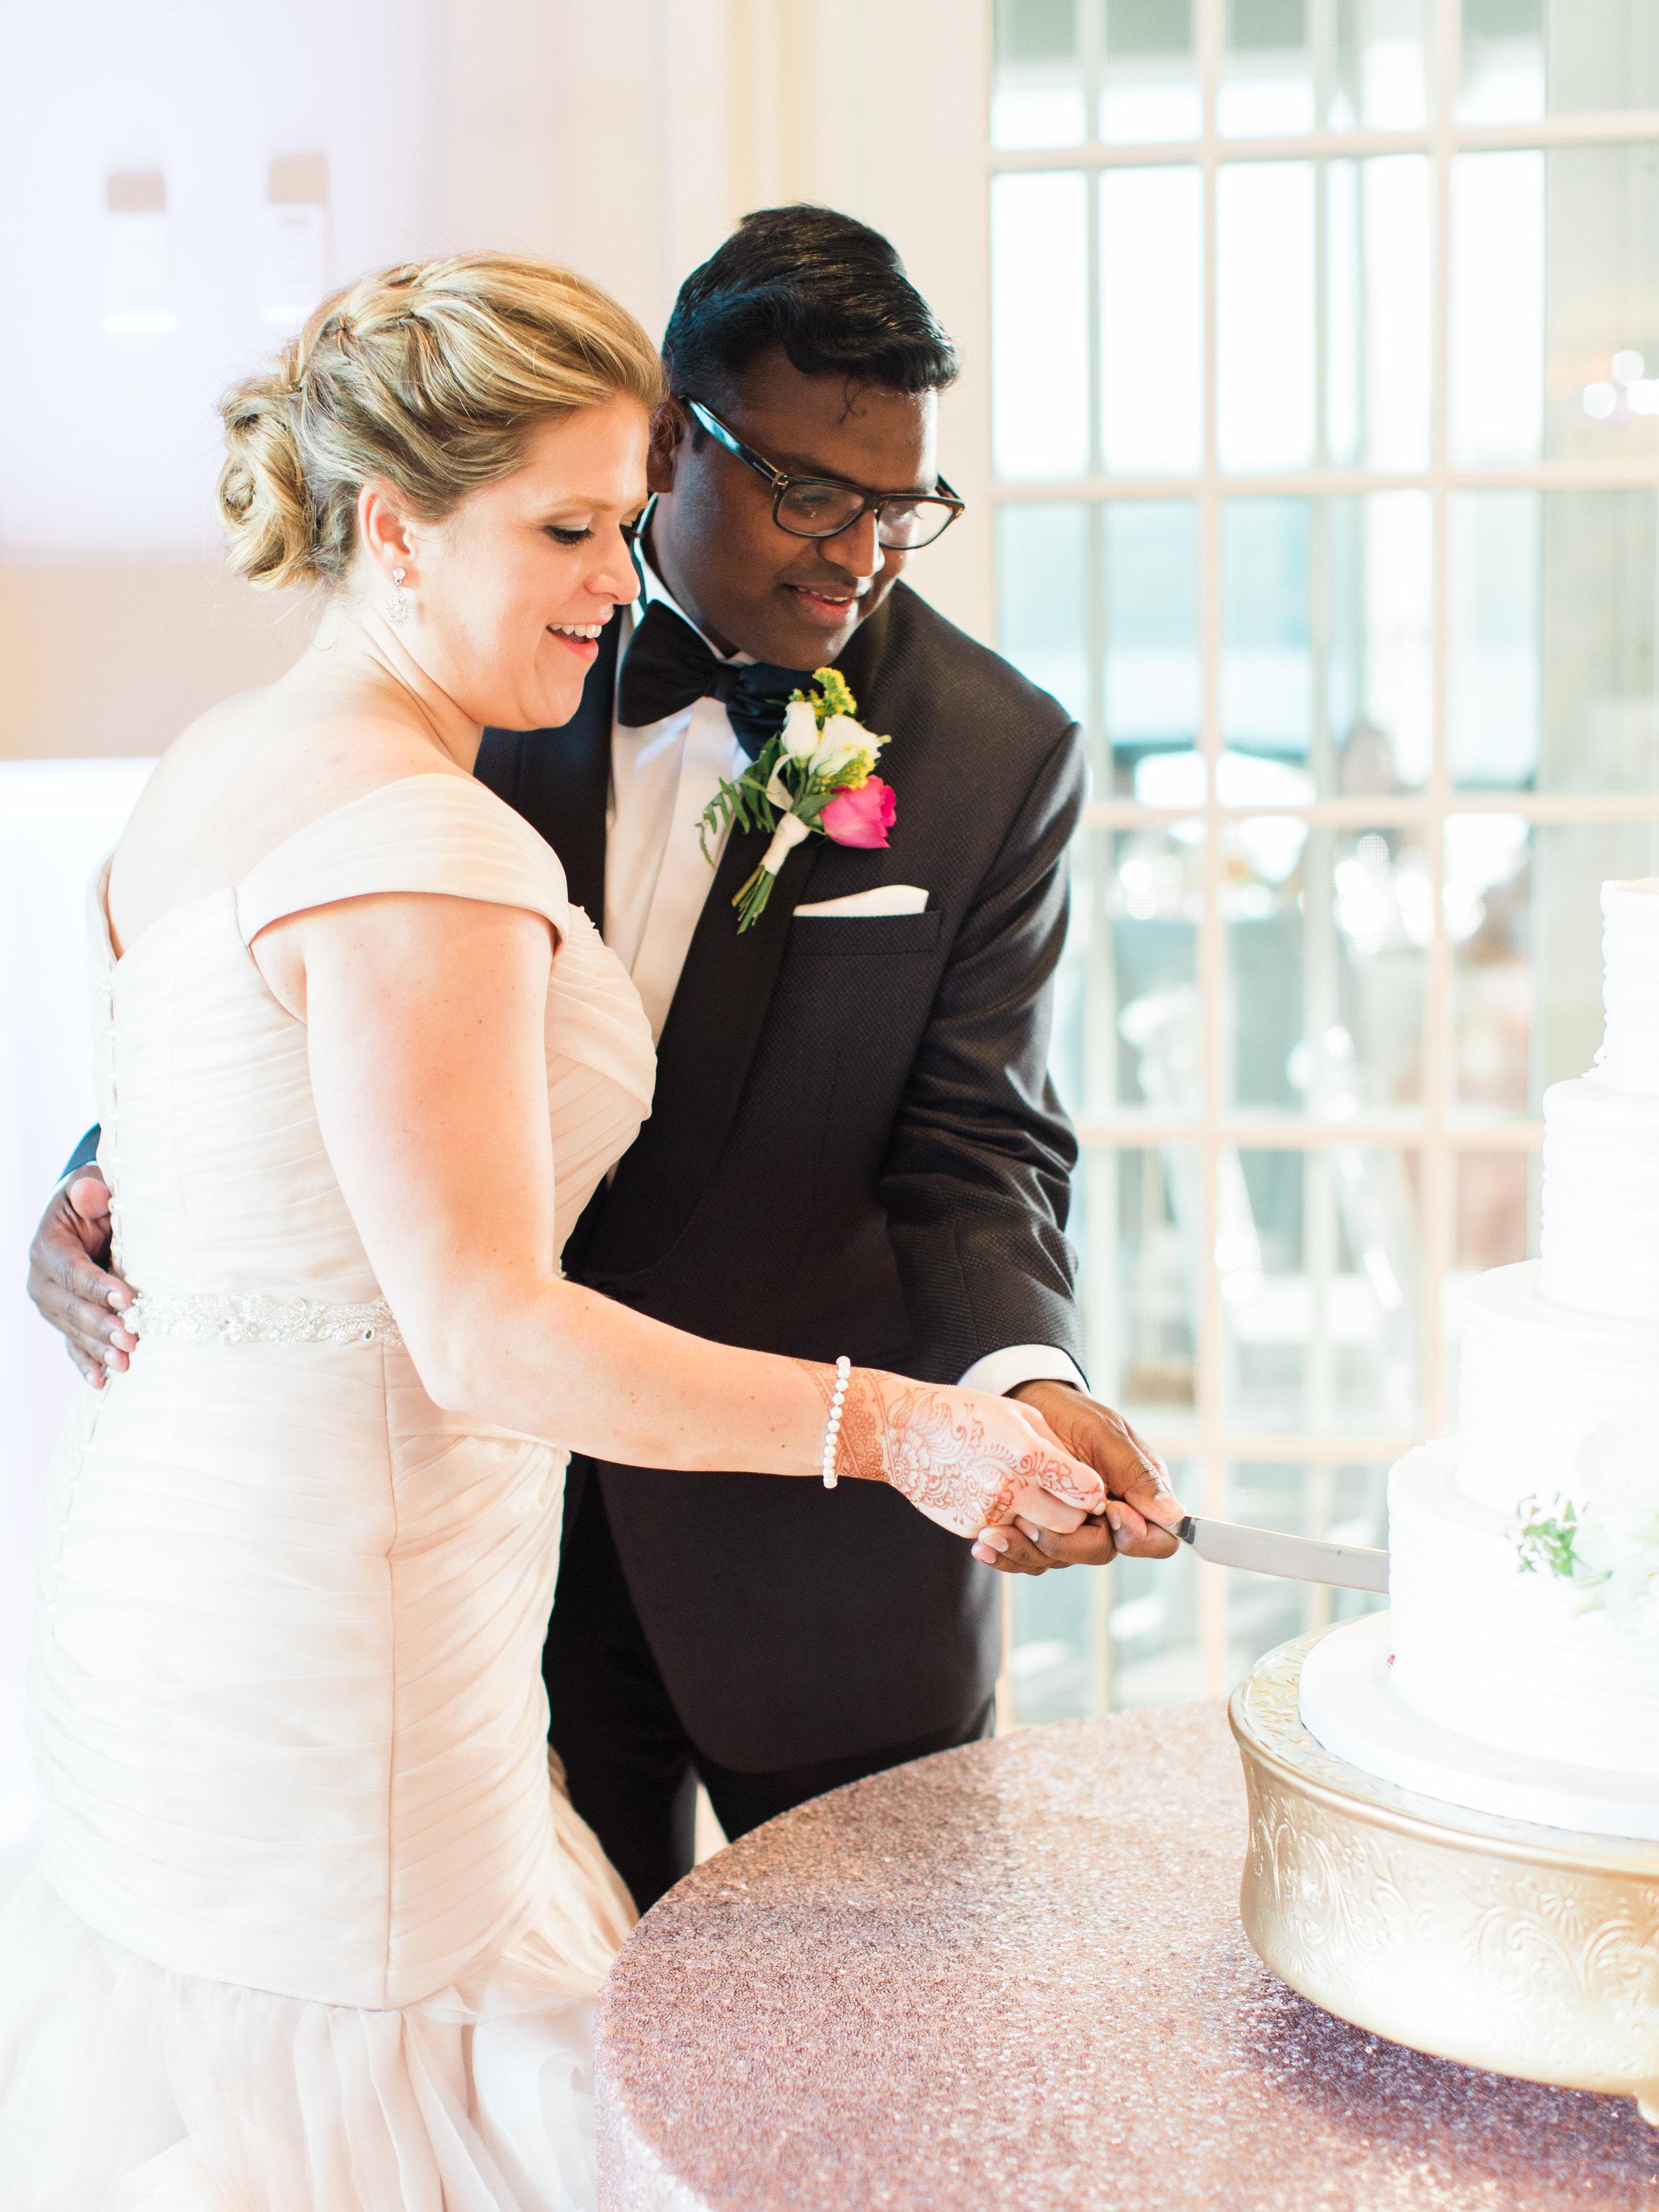 Govathoti+Wedding+Reception+Cake+Cutting-6.jpg